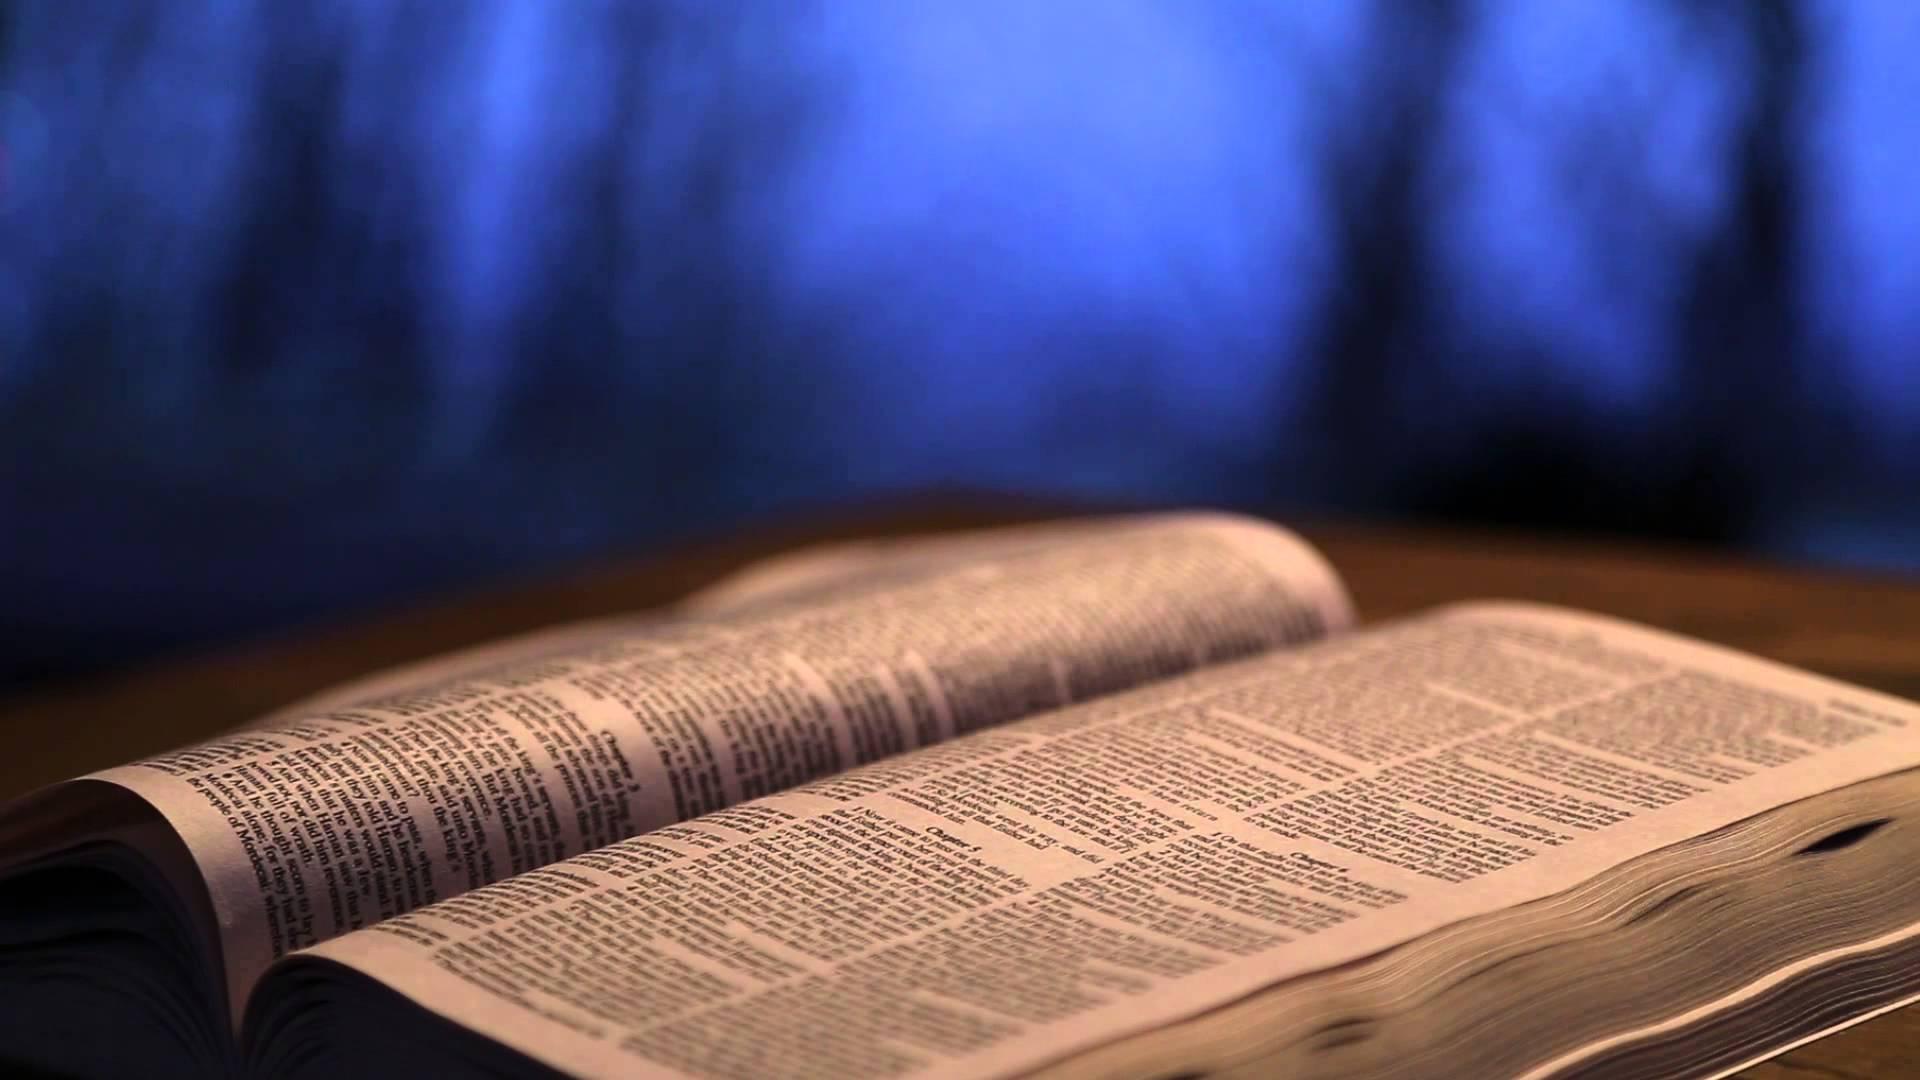 Verses Bible